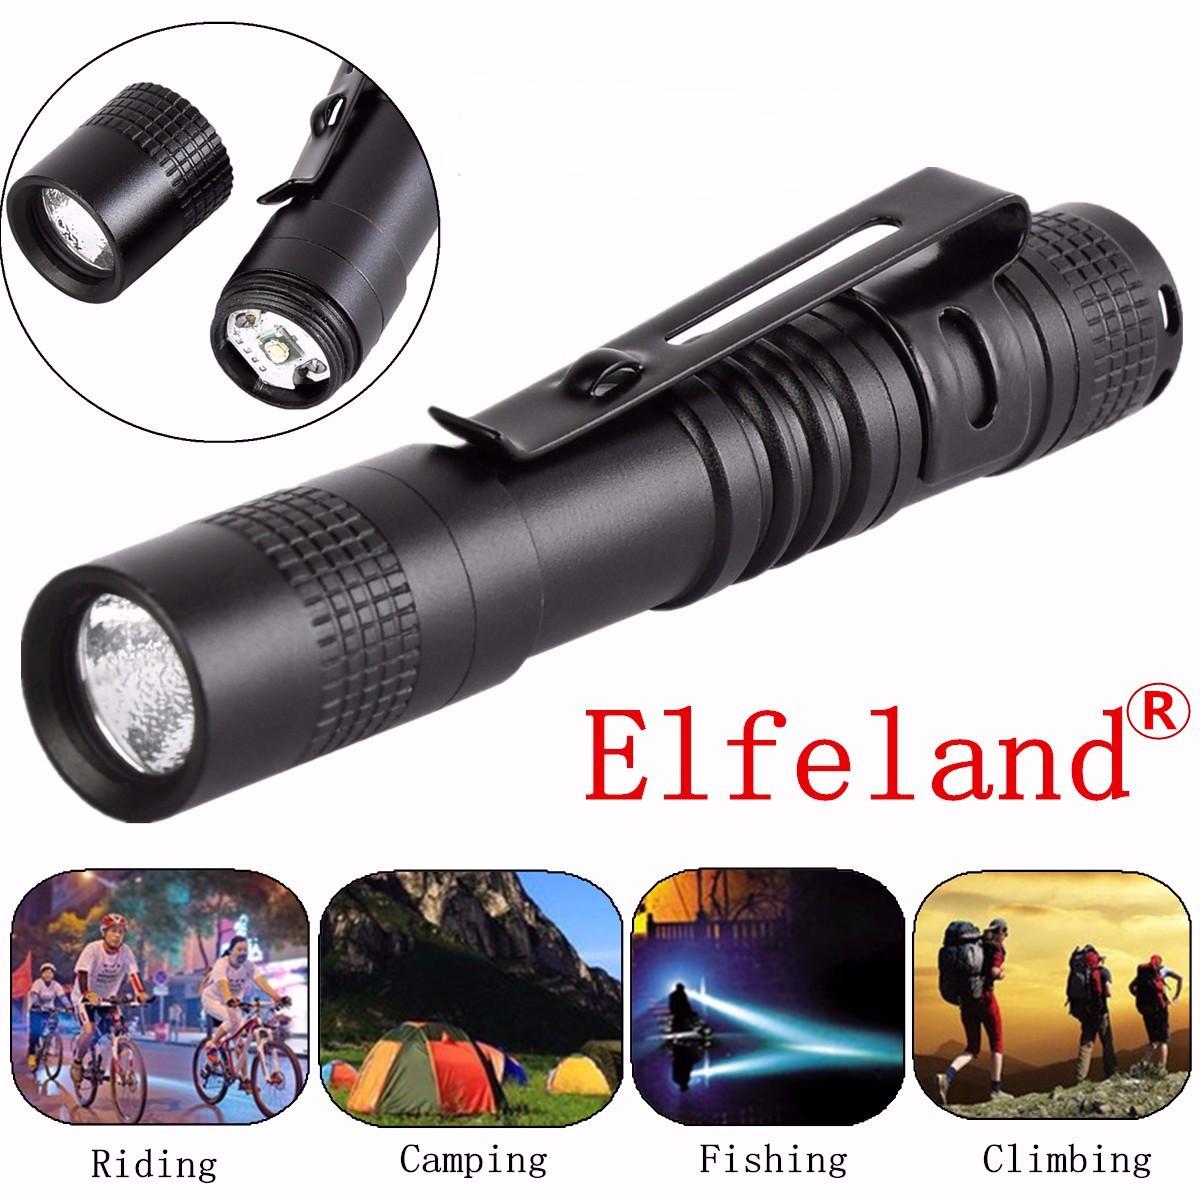 5-Pack LED Mini Flashlight Torch Portable Flashlight Pocket Outdoor Camping Penlight Lighting Lamp Light For Camping Hiking